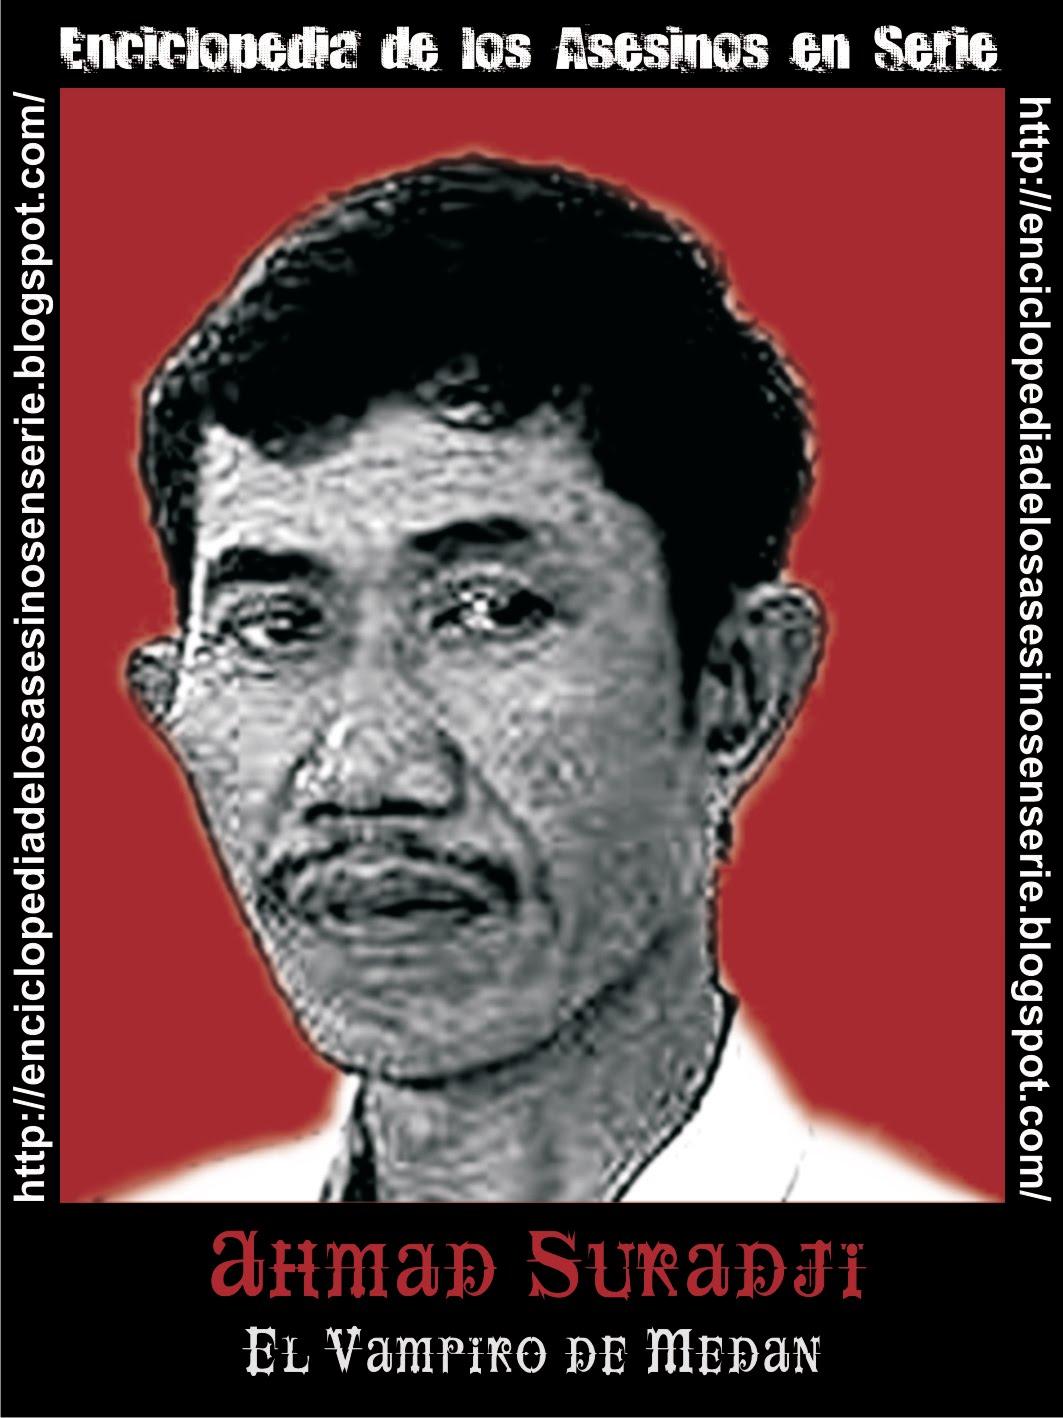 "AHMAD SURADJI ""EL VAMPIRO DE MEDAN"" (INDONESIA)"